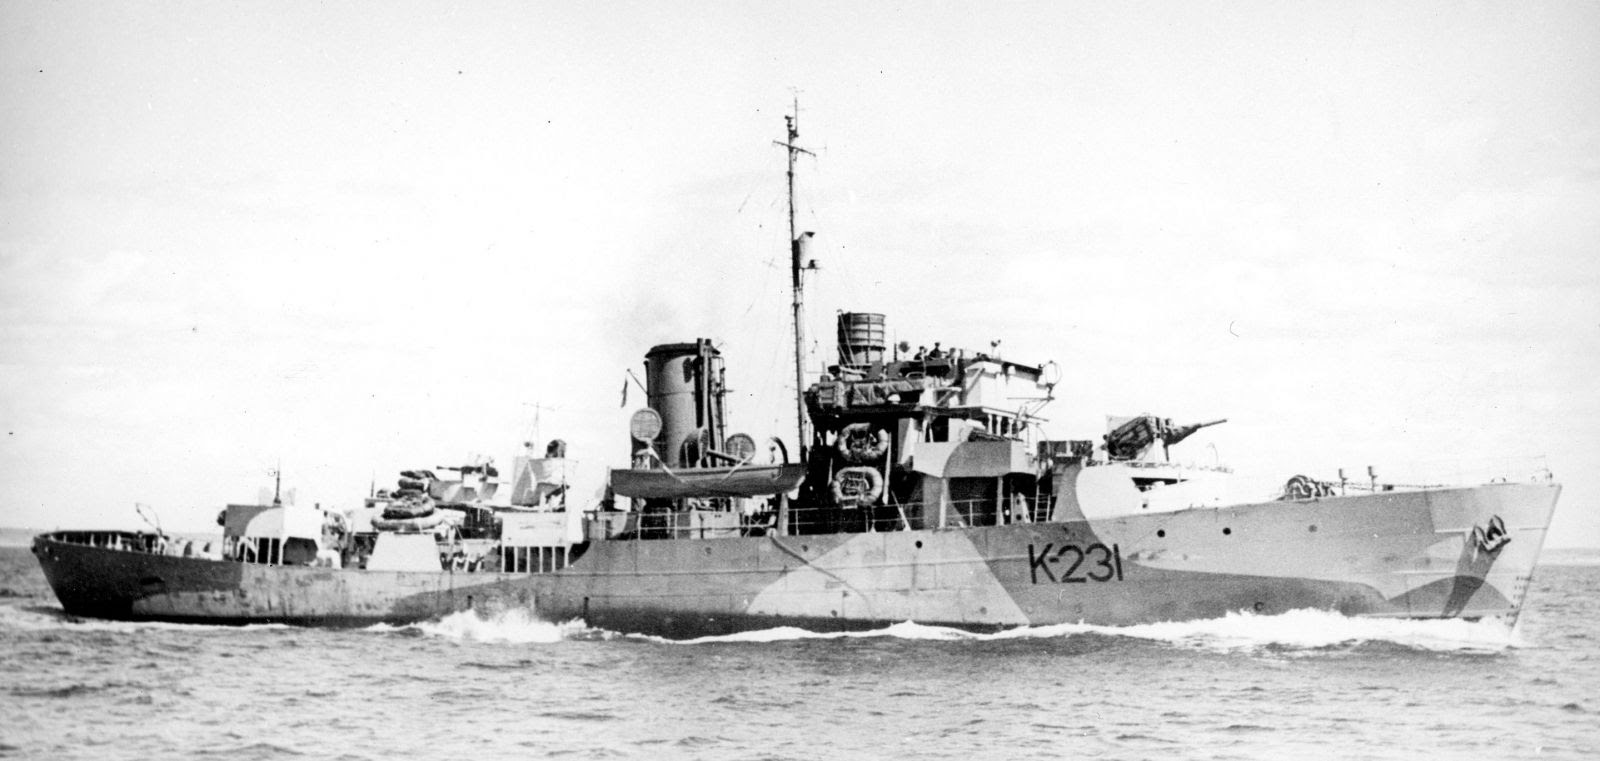 The sinking of U-536